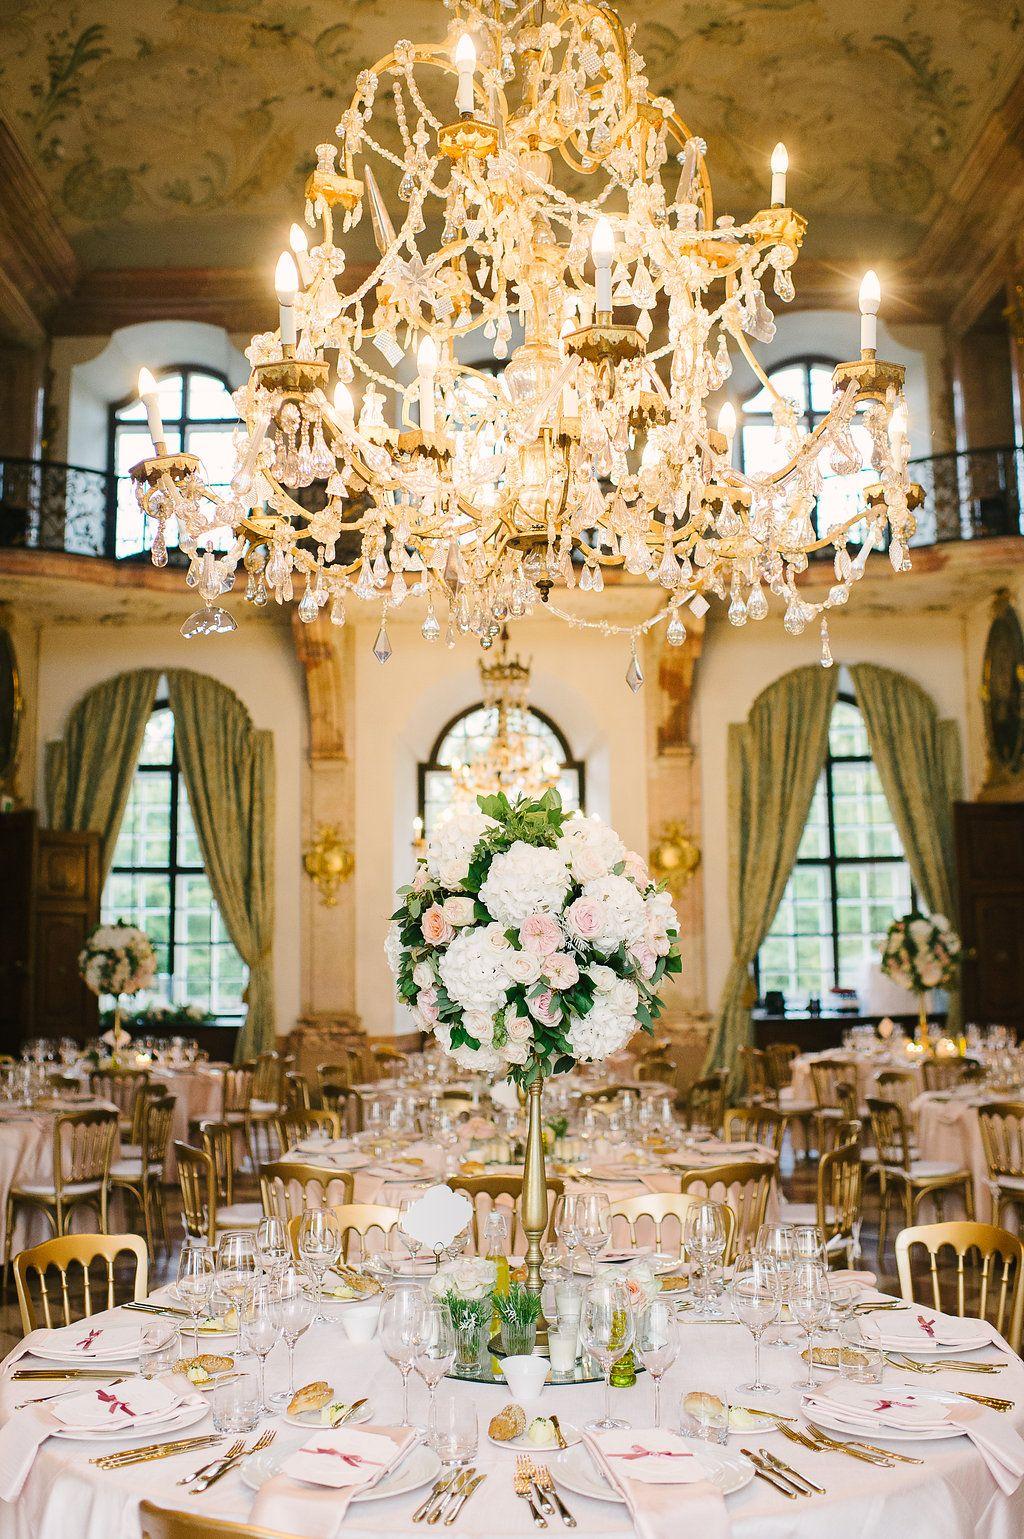 Table setup and flower decoration at schloss leopoldskron salzburg table setup and flower decoration at schloss leopoldskron salzburg weddingplanner daniela kainz junglespirit Choice Image